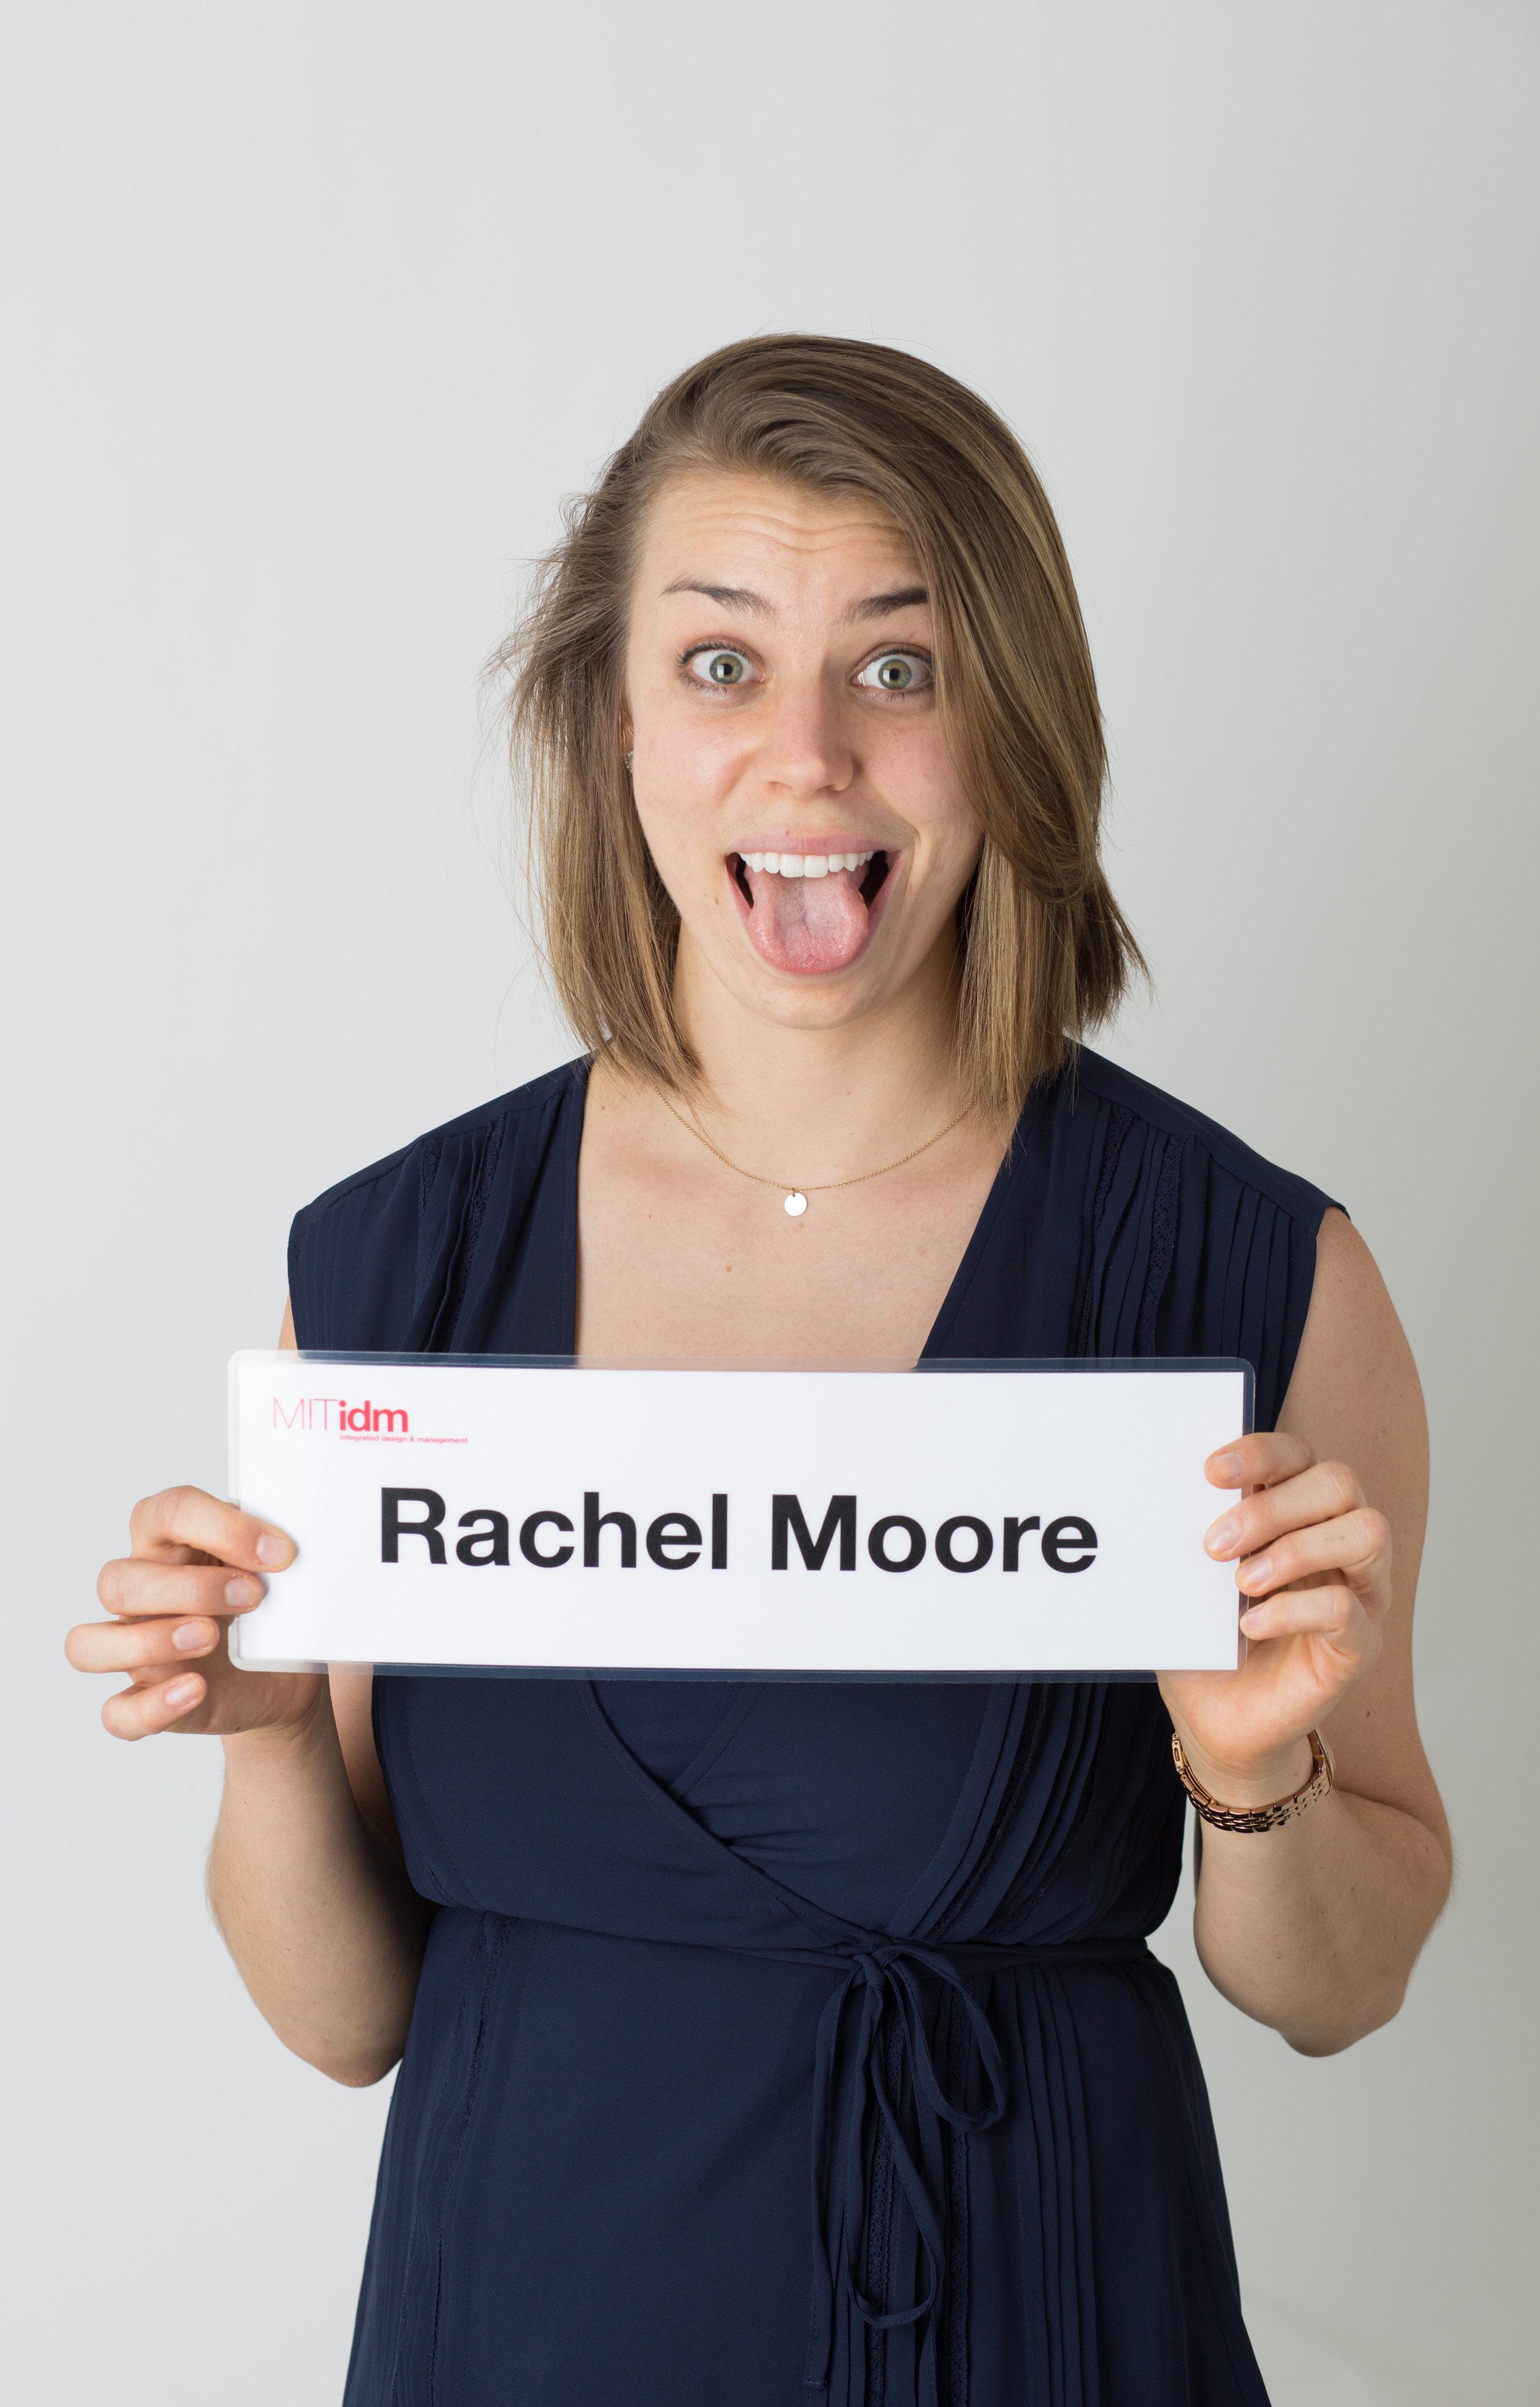 RachelMoore_Headshot_Sept2017.jpg